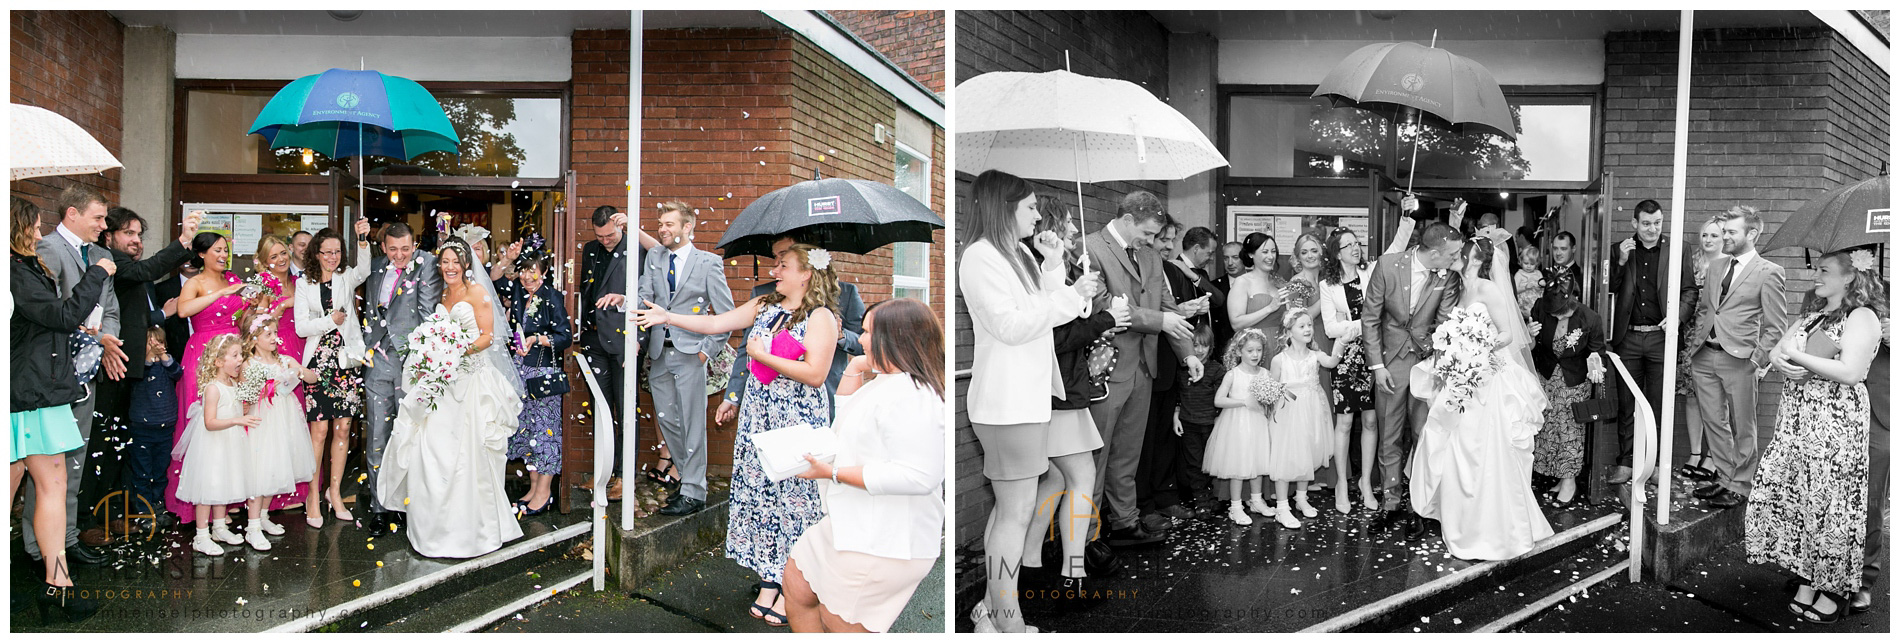 Confetti wedding photographs at St Albans Church, Stockport